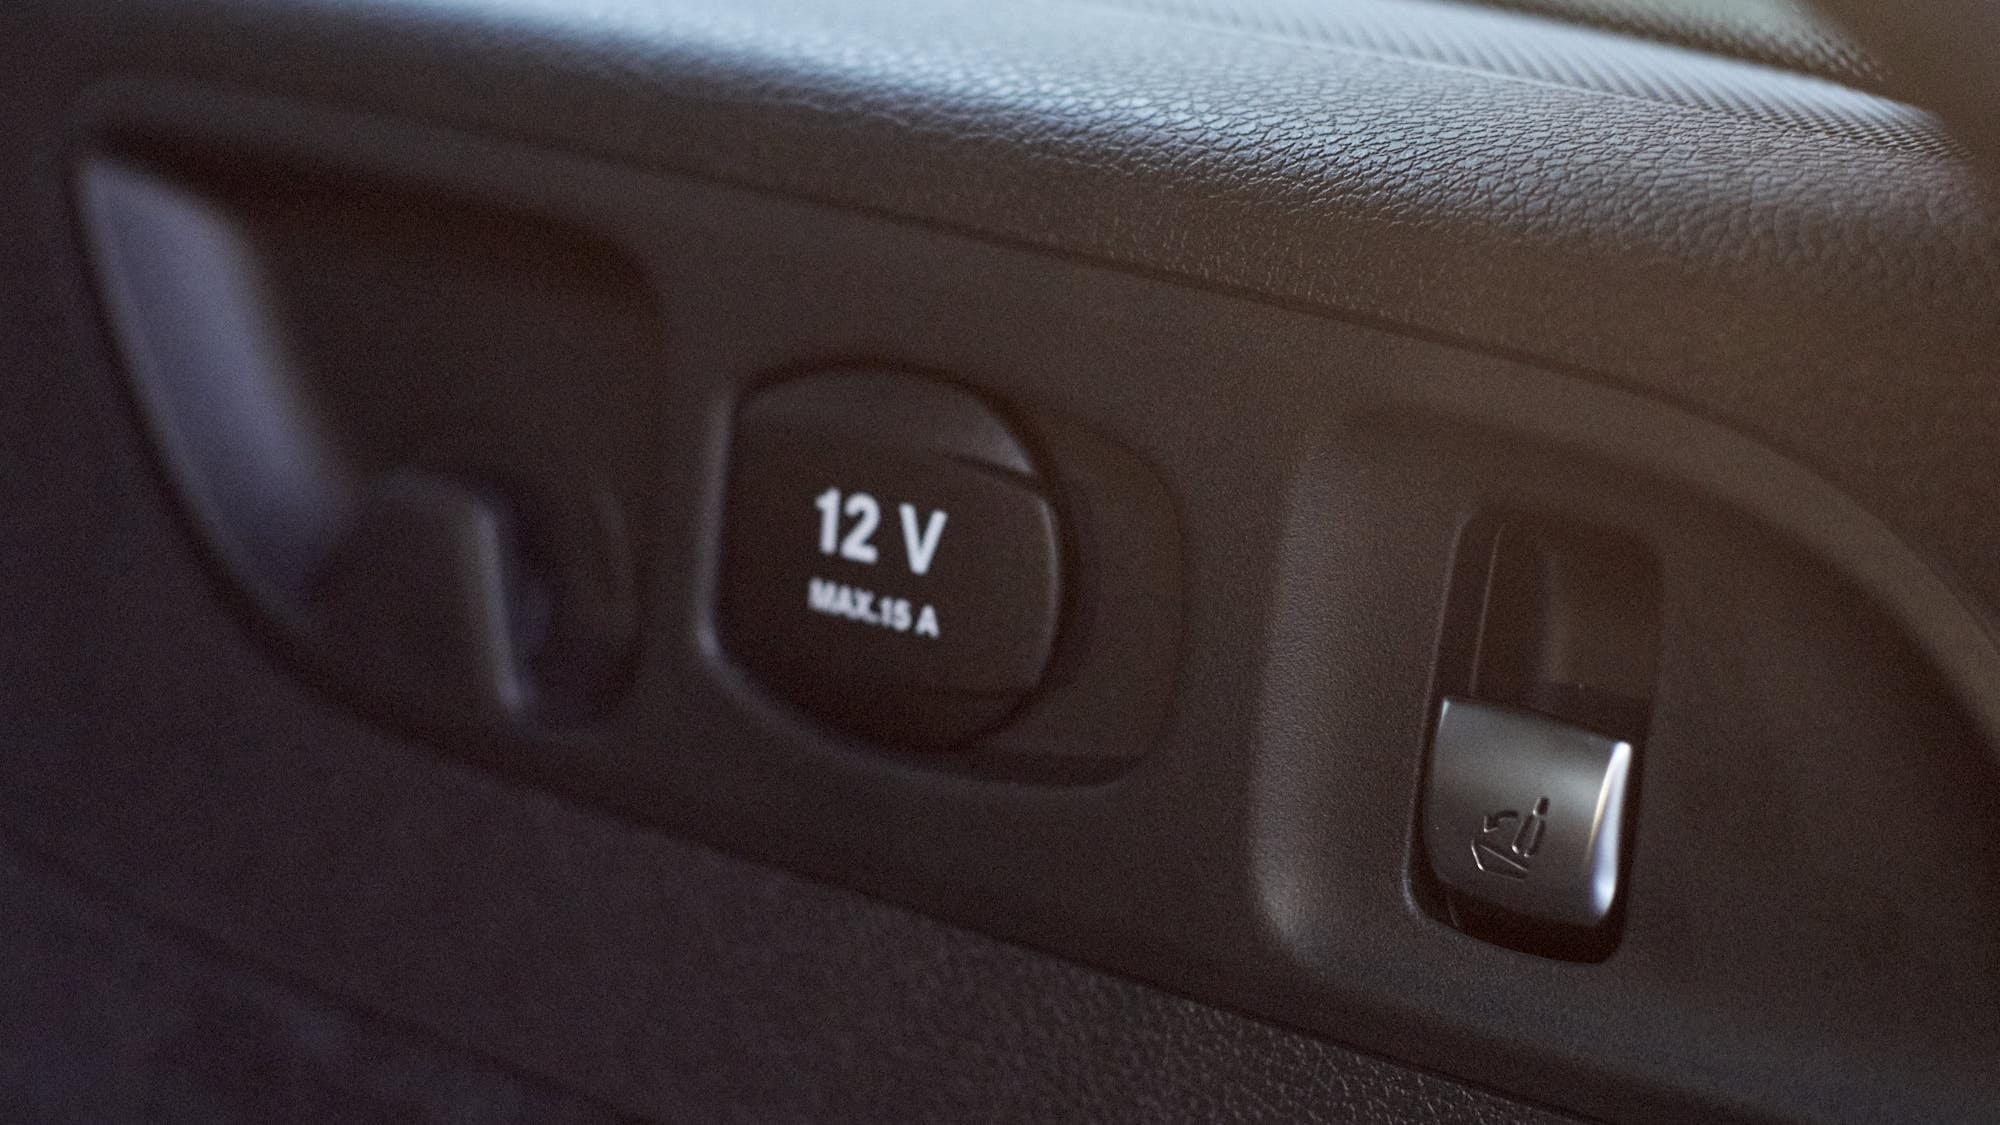 Mercedes-AMG E63 S+ estate 12v socket